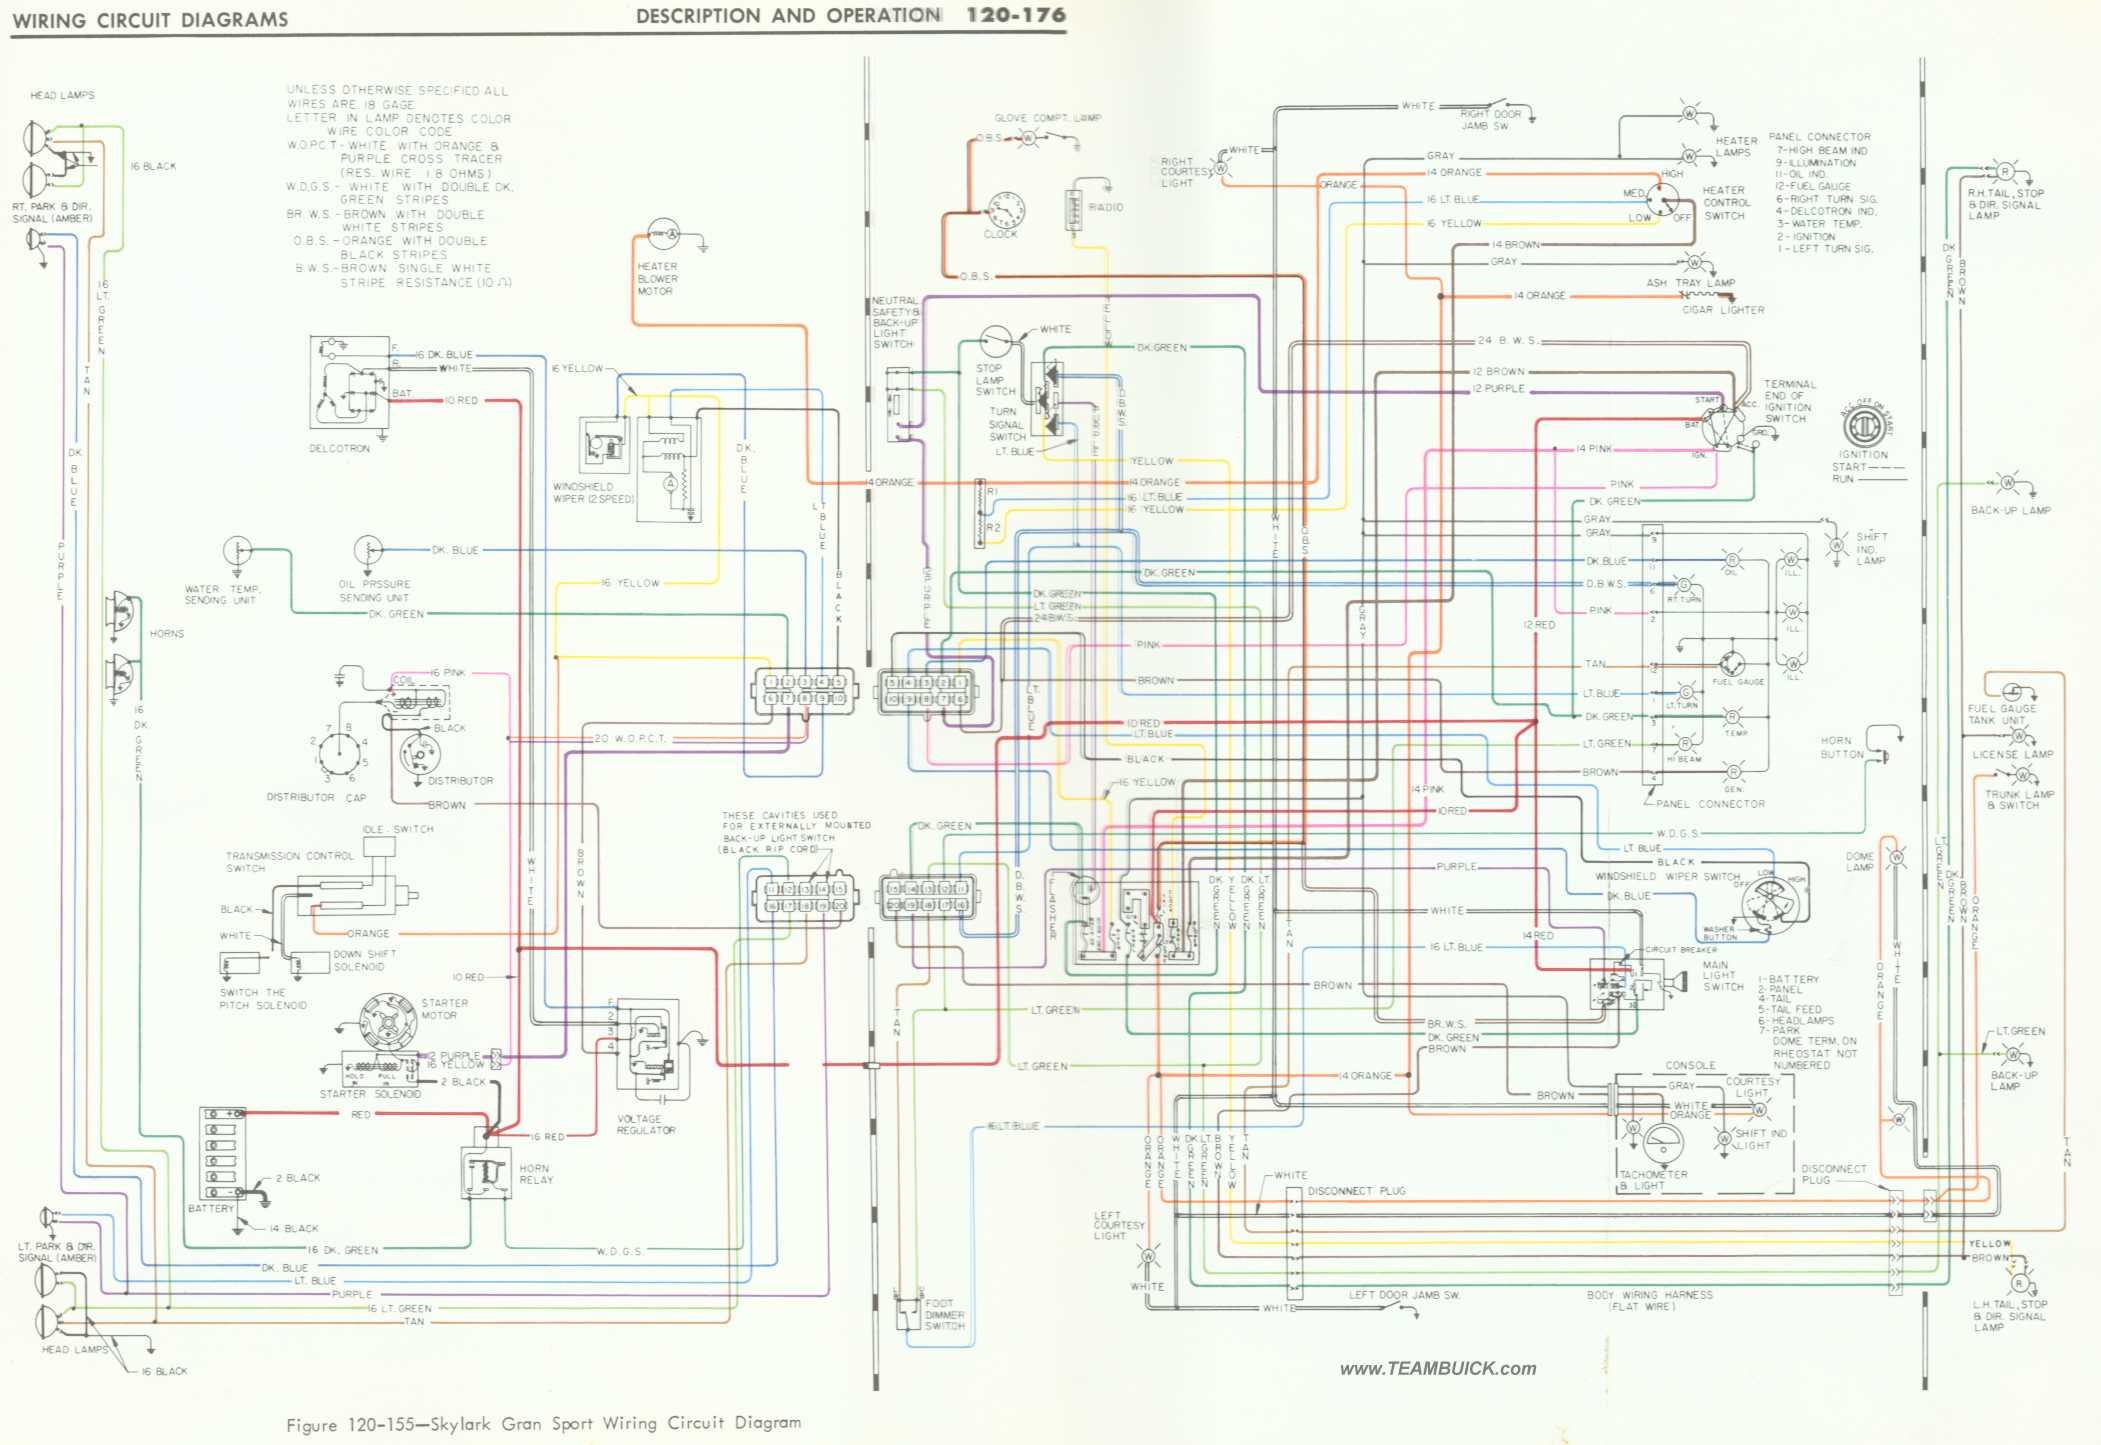 1966 Buick Skylark Gs Wiring Diagram